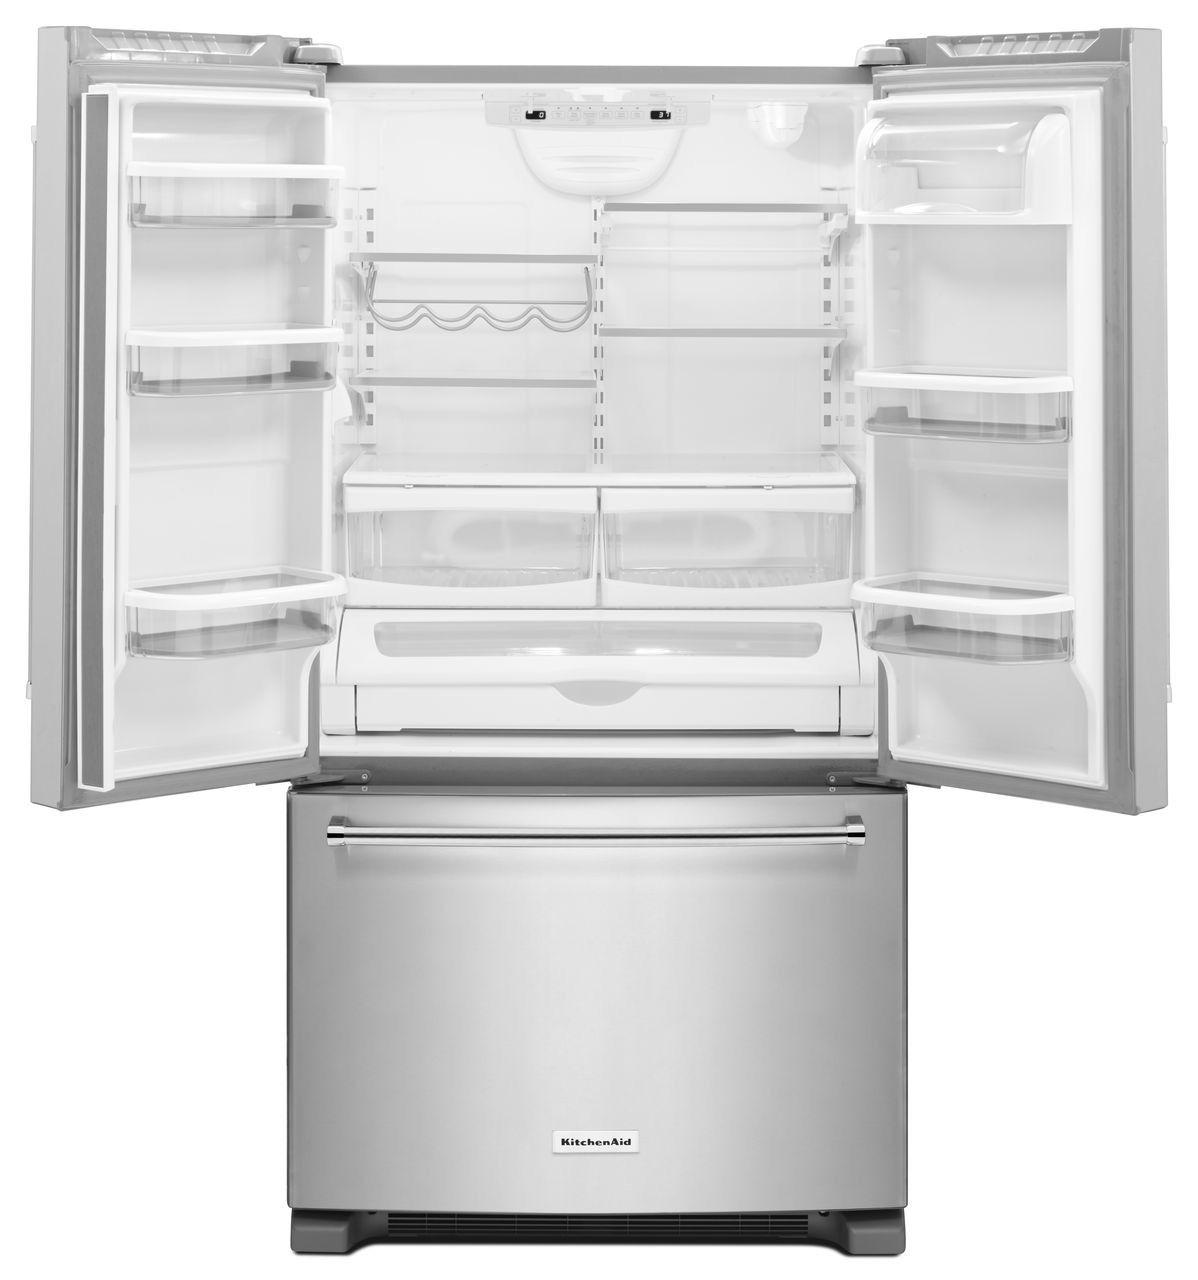 Kitchenaid 25 cuft french door refrigerator krff305ess main image 1 2 3 kitchenaid 25 cu ft white french door refrigerator rubansaba